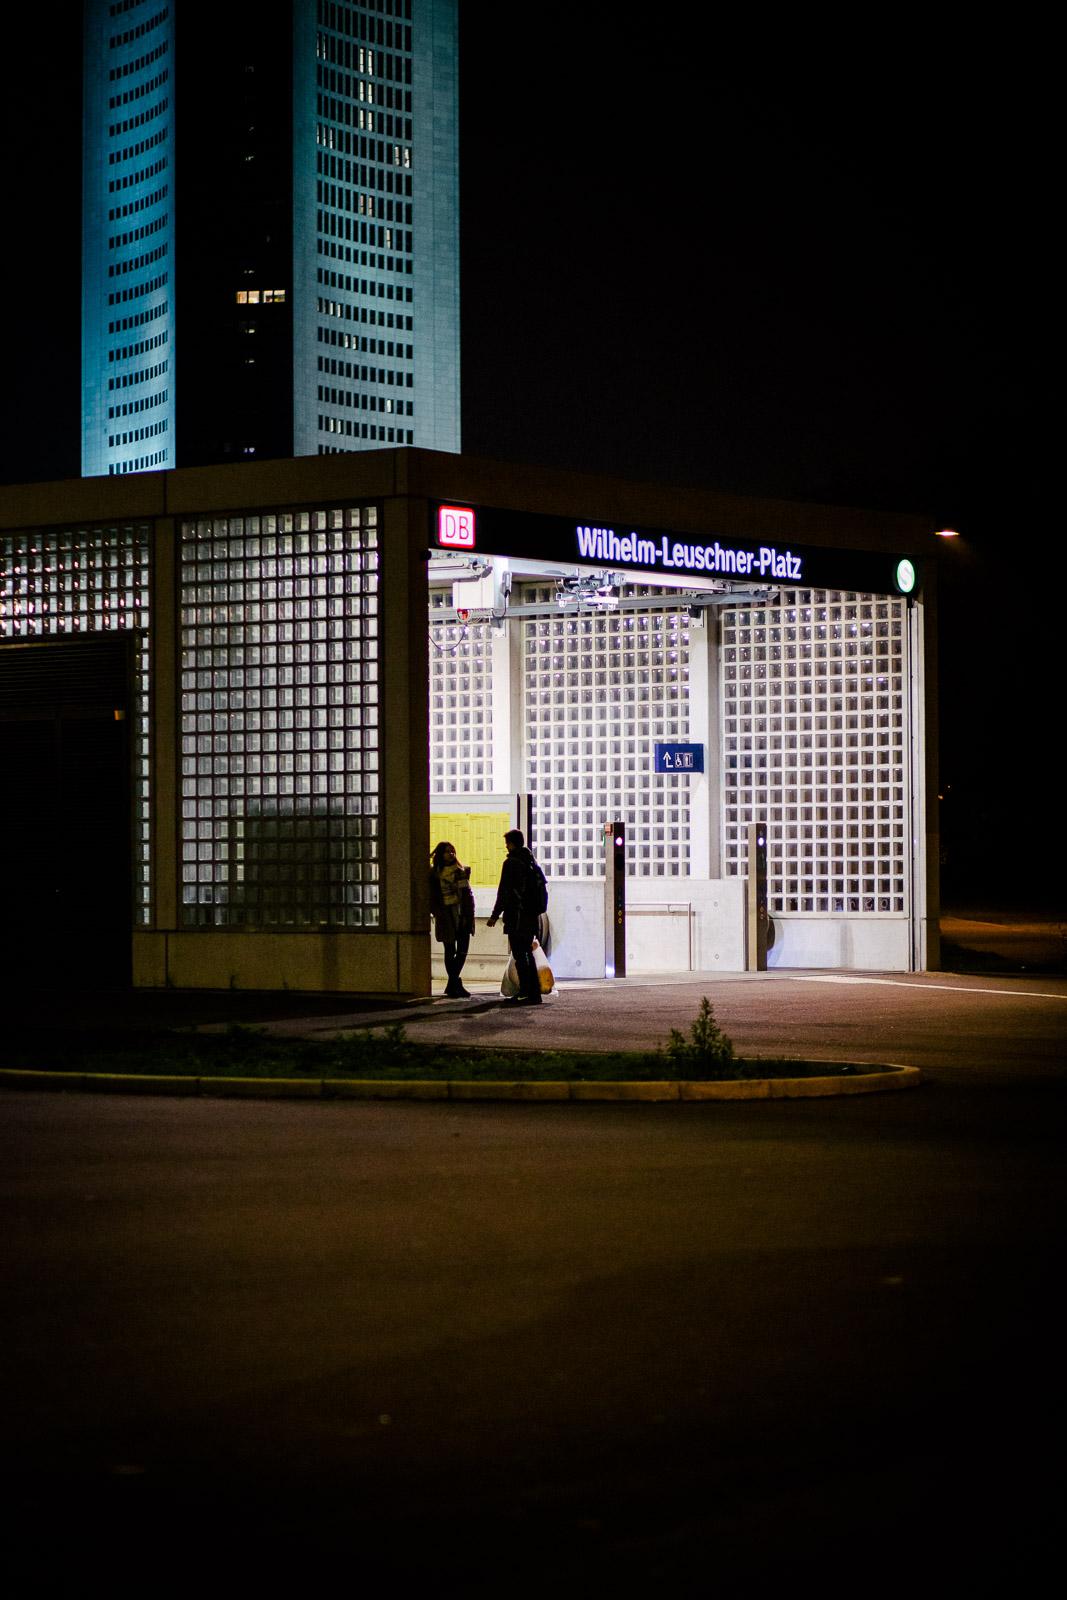 LEIPZIG, Bahnhofsromantik